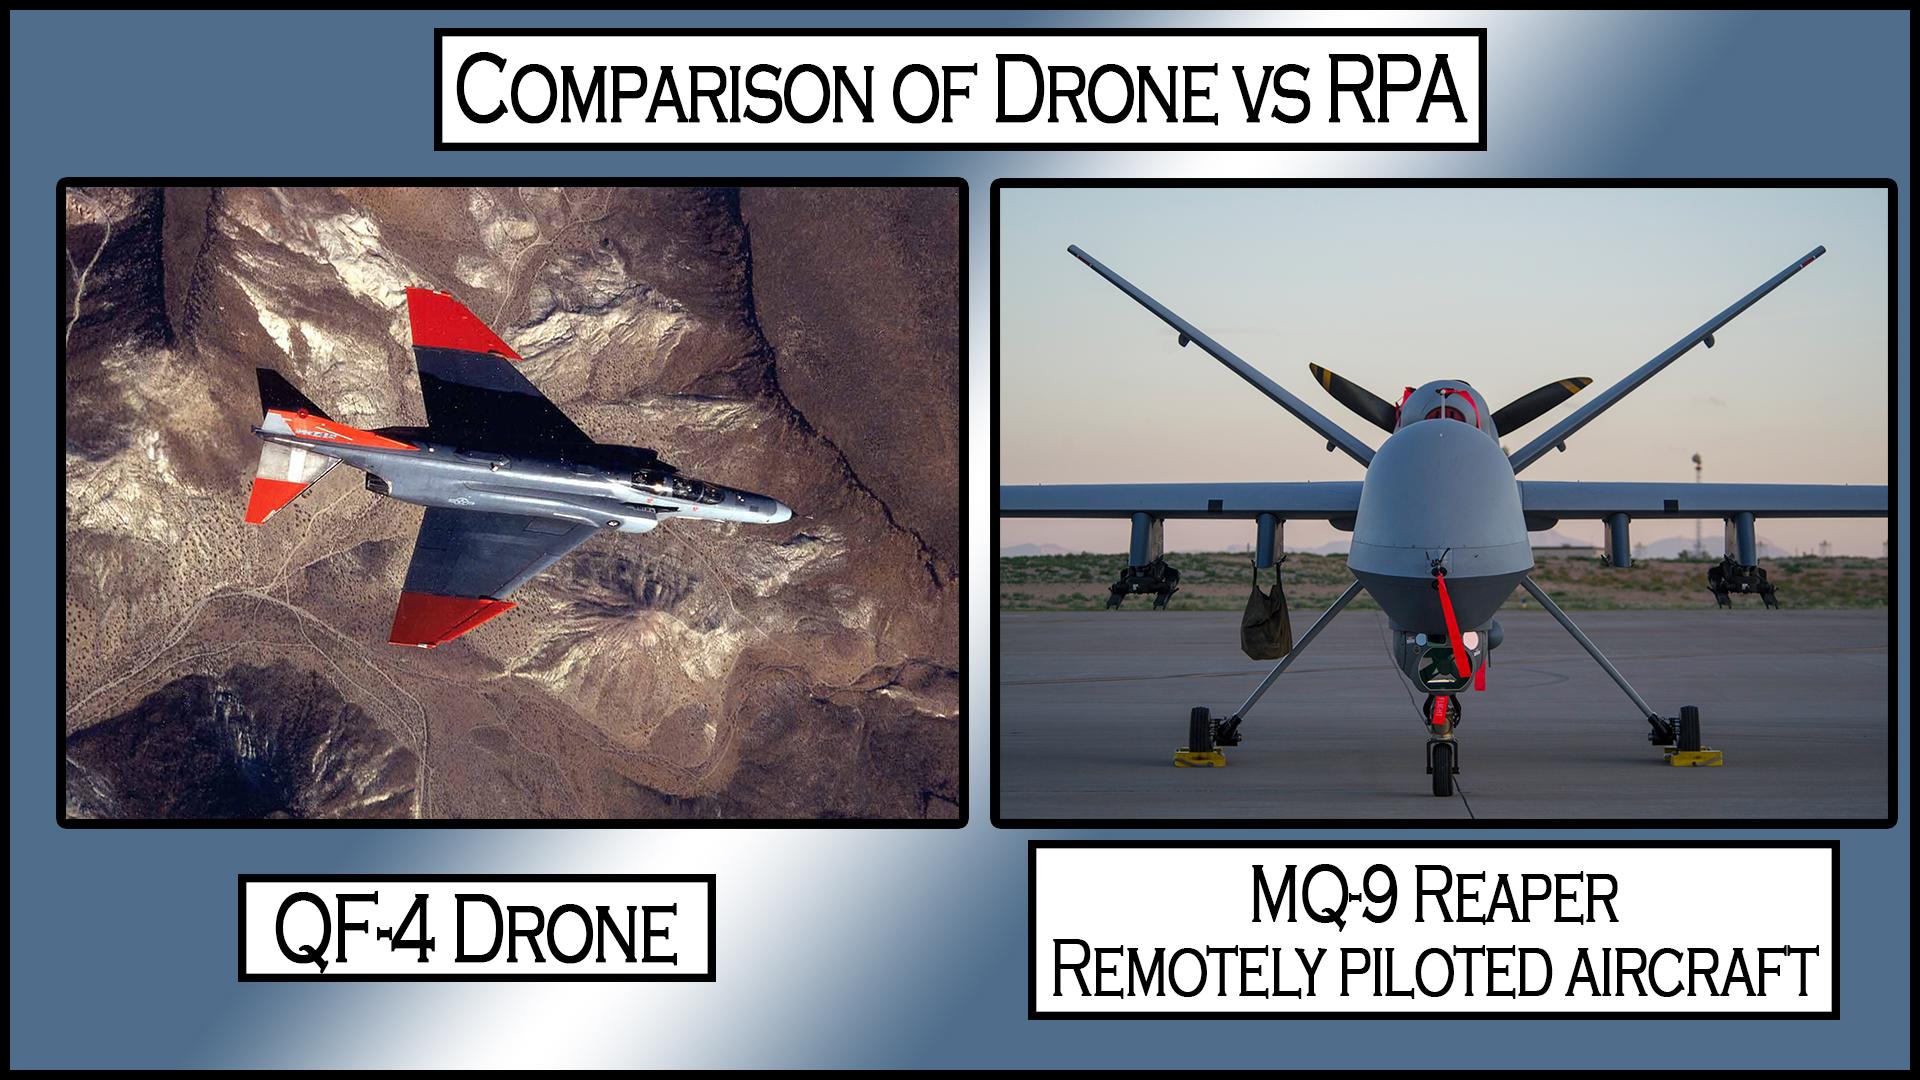 RPAs Defeat Drones In Air Superiority